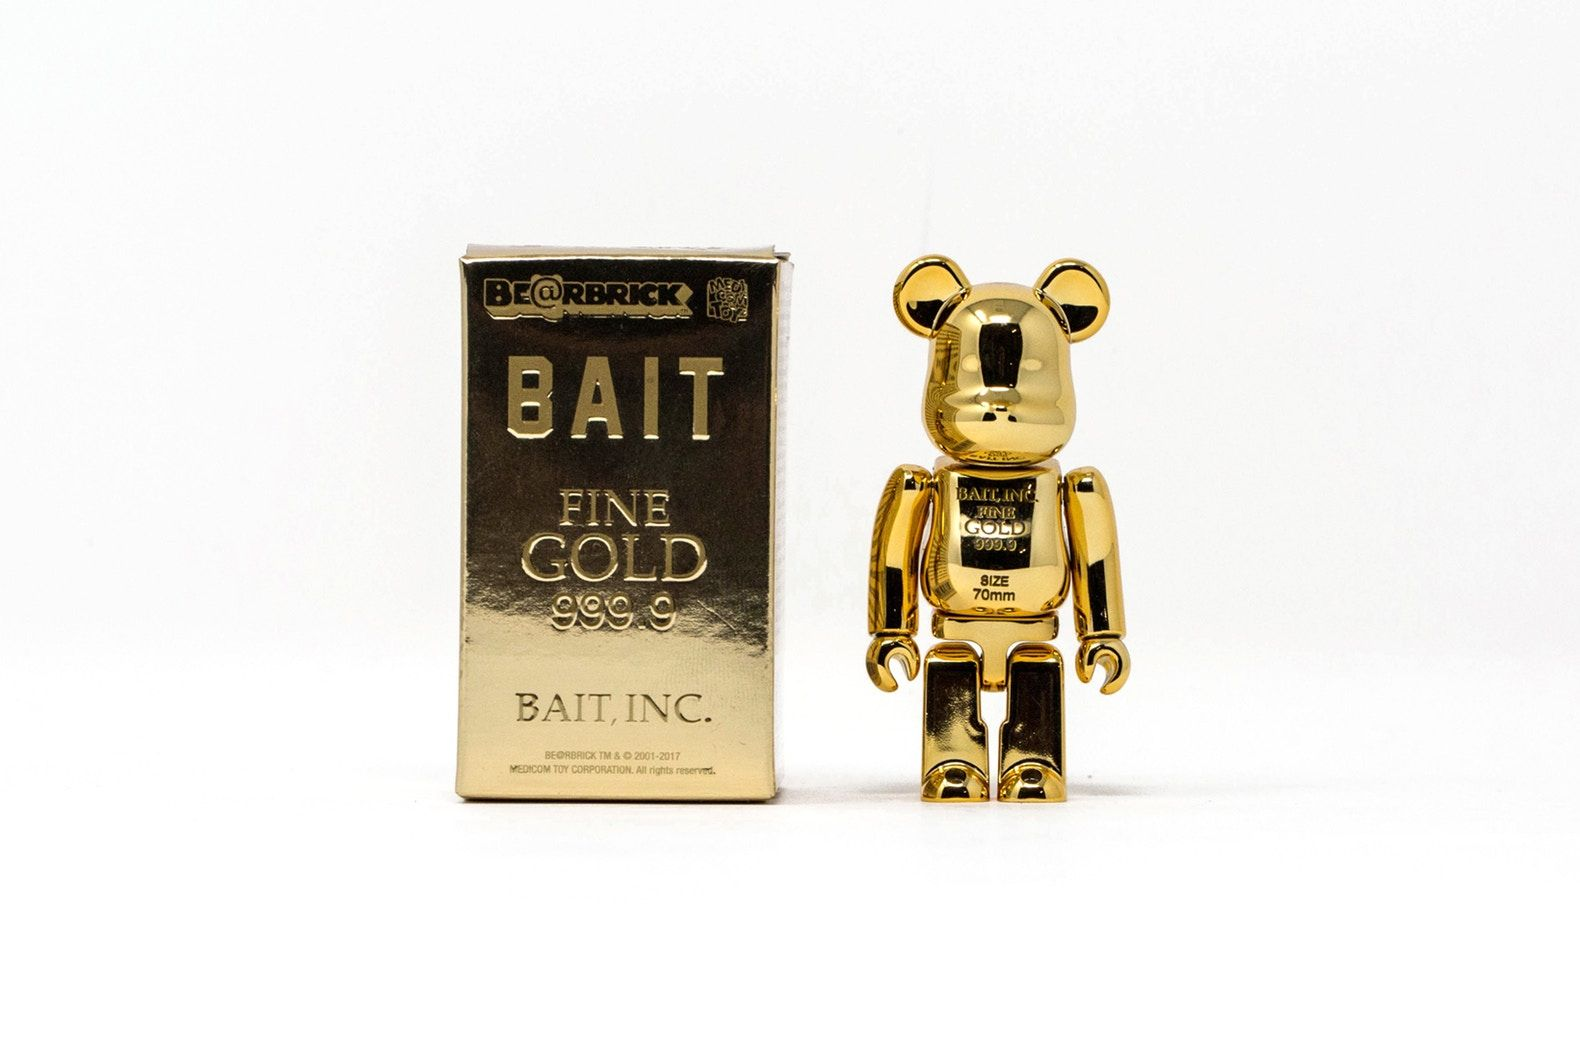 d4ce91a0 BAIT x Medicom Toy Bearbrick GOLD BARS design be@rbrick 100% 400% toy  figurine